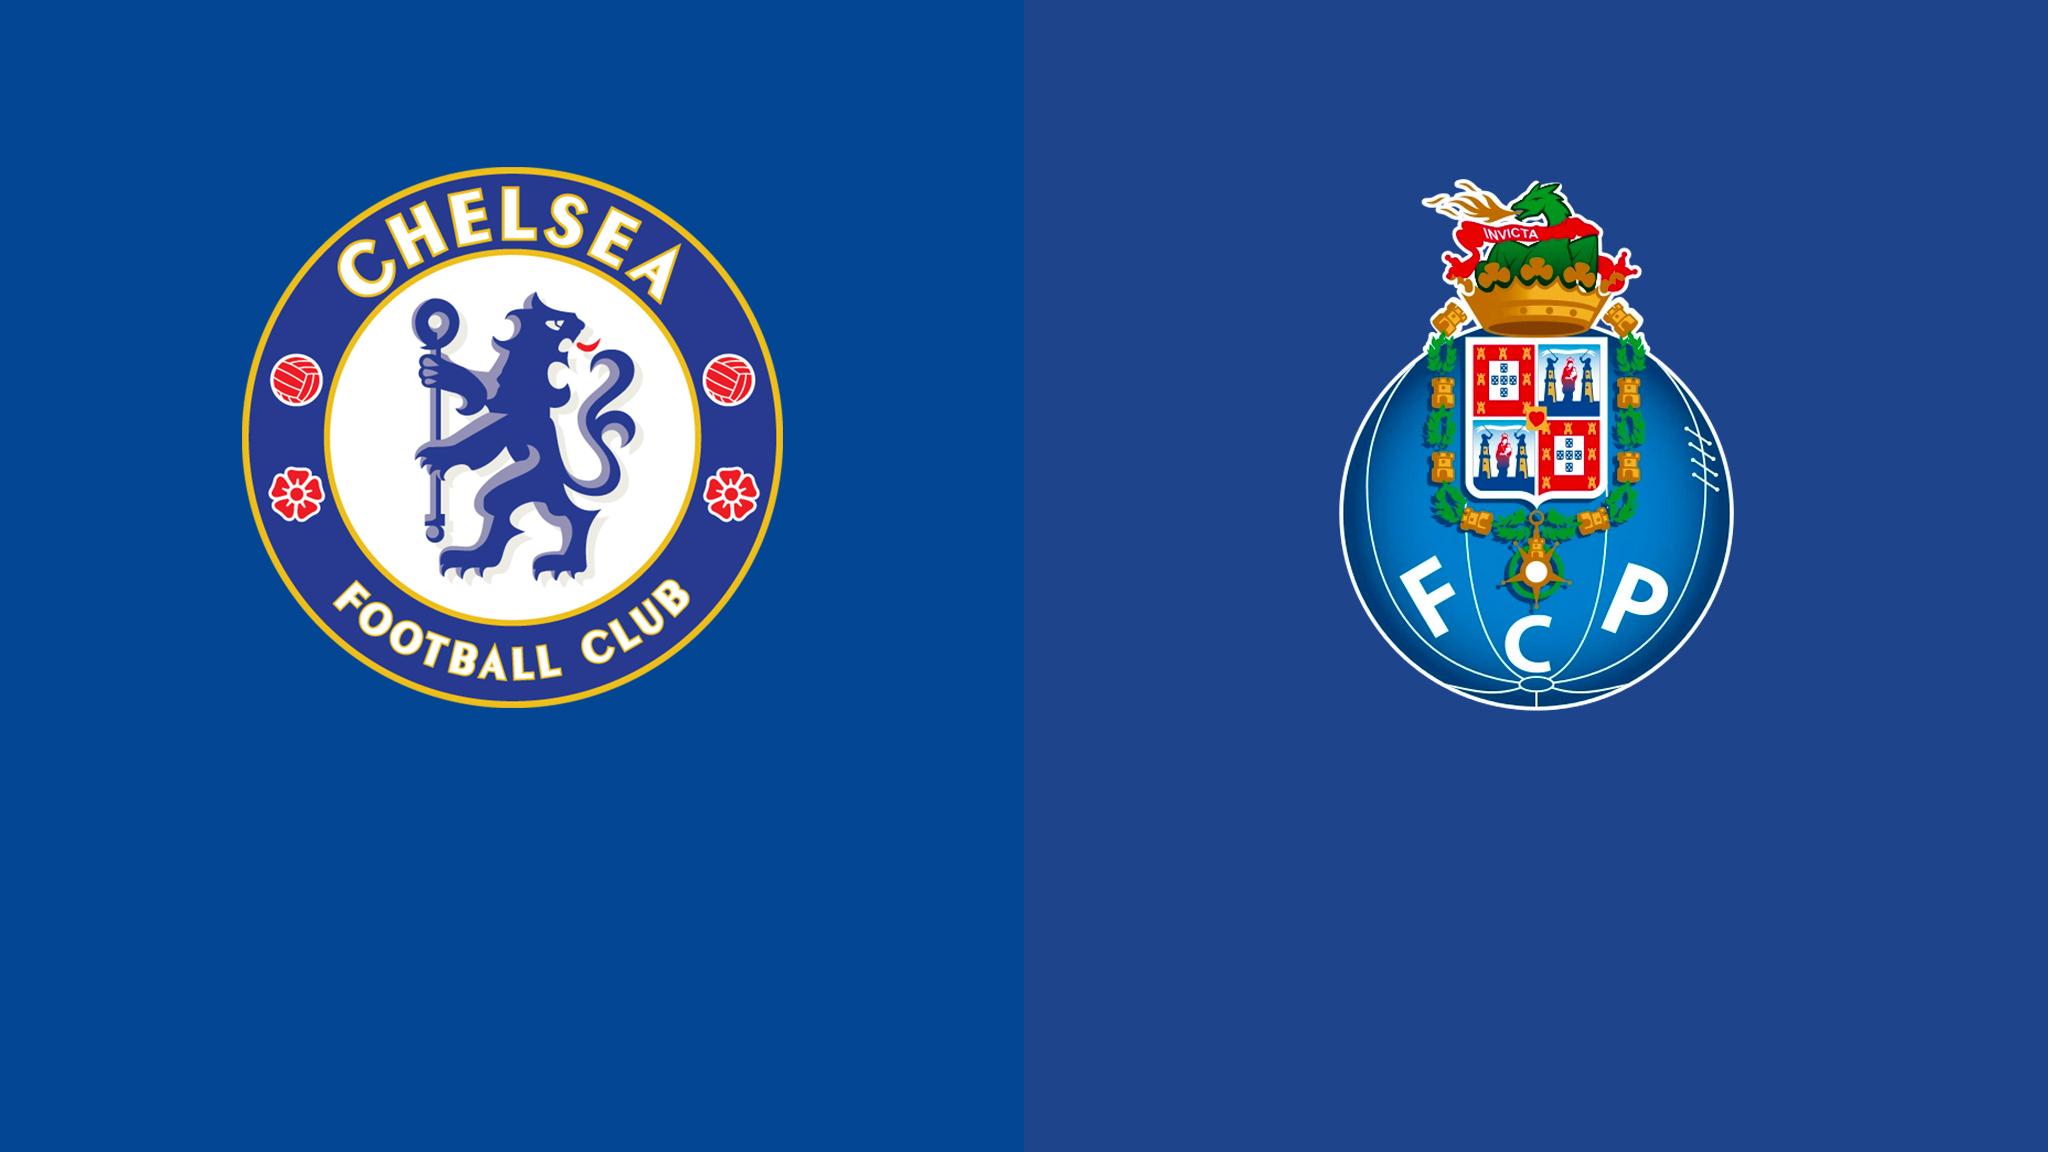 Chelsea vs Porto second leg